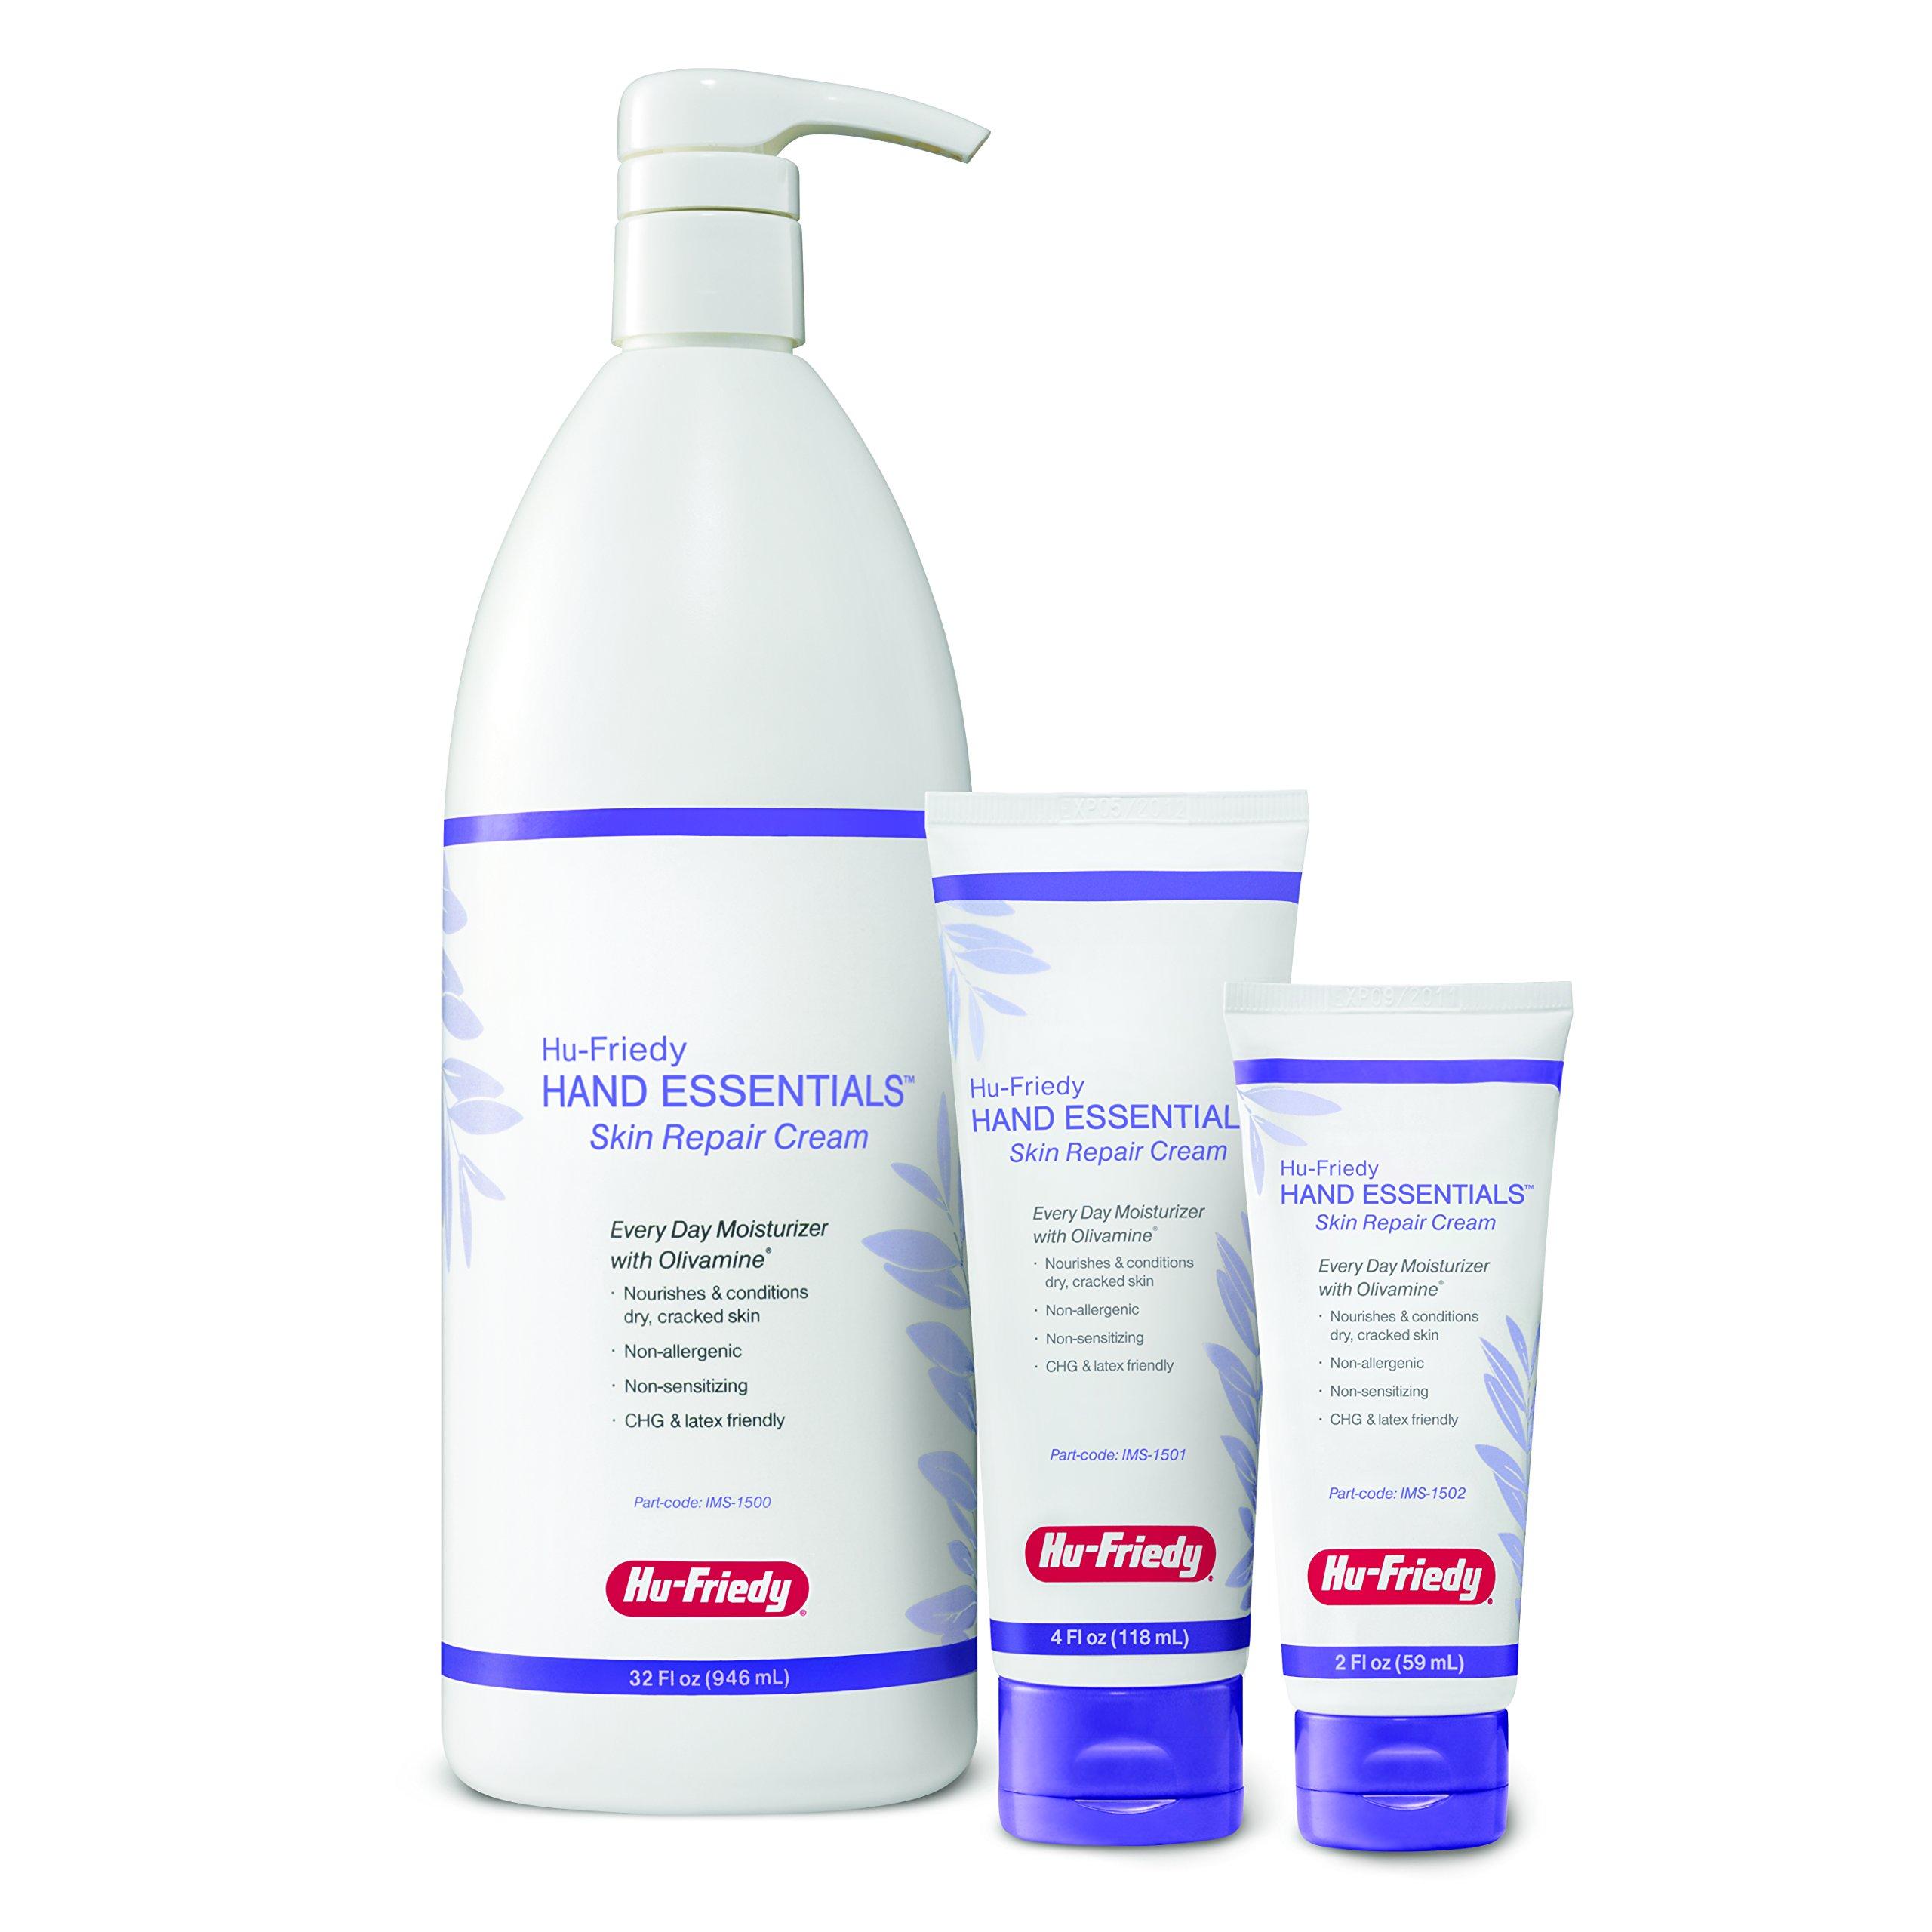 Hu-Friedy IMS-1508 Hand Essentials Skin Repair Cream, 4 mL